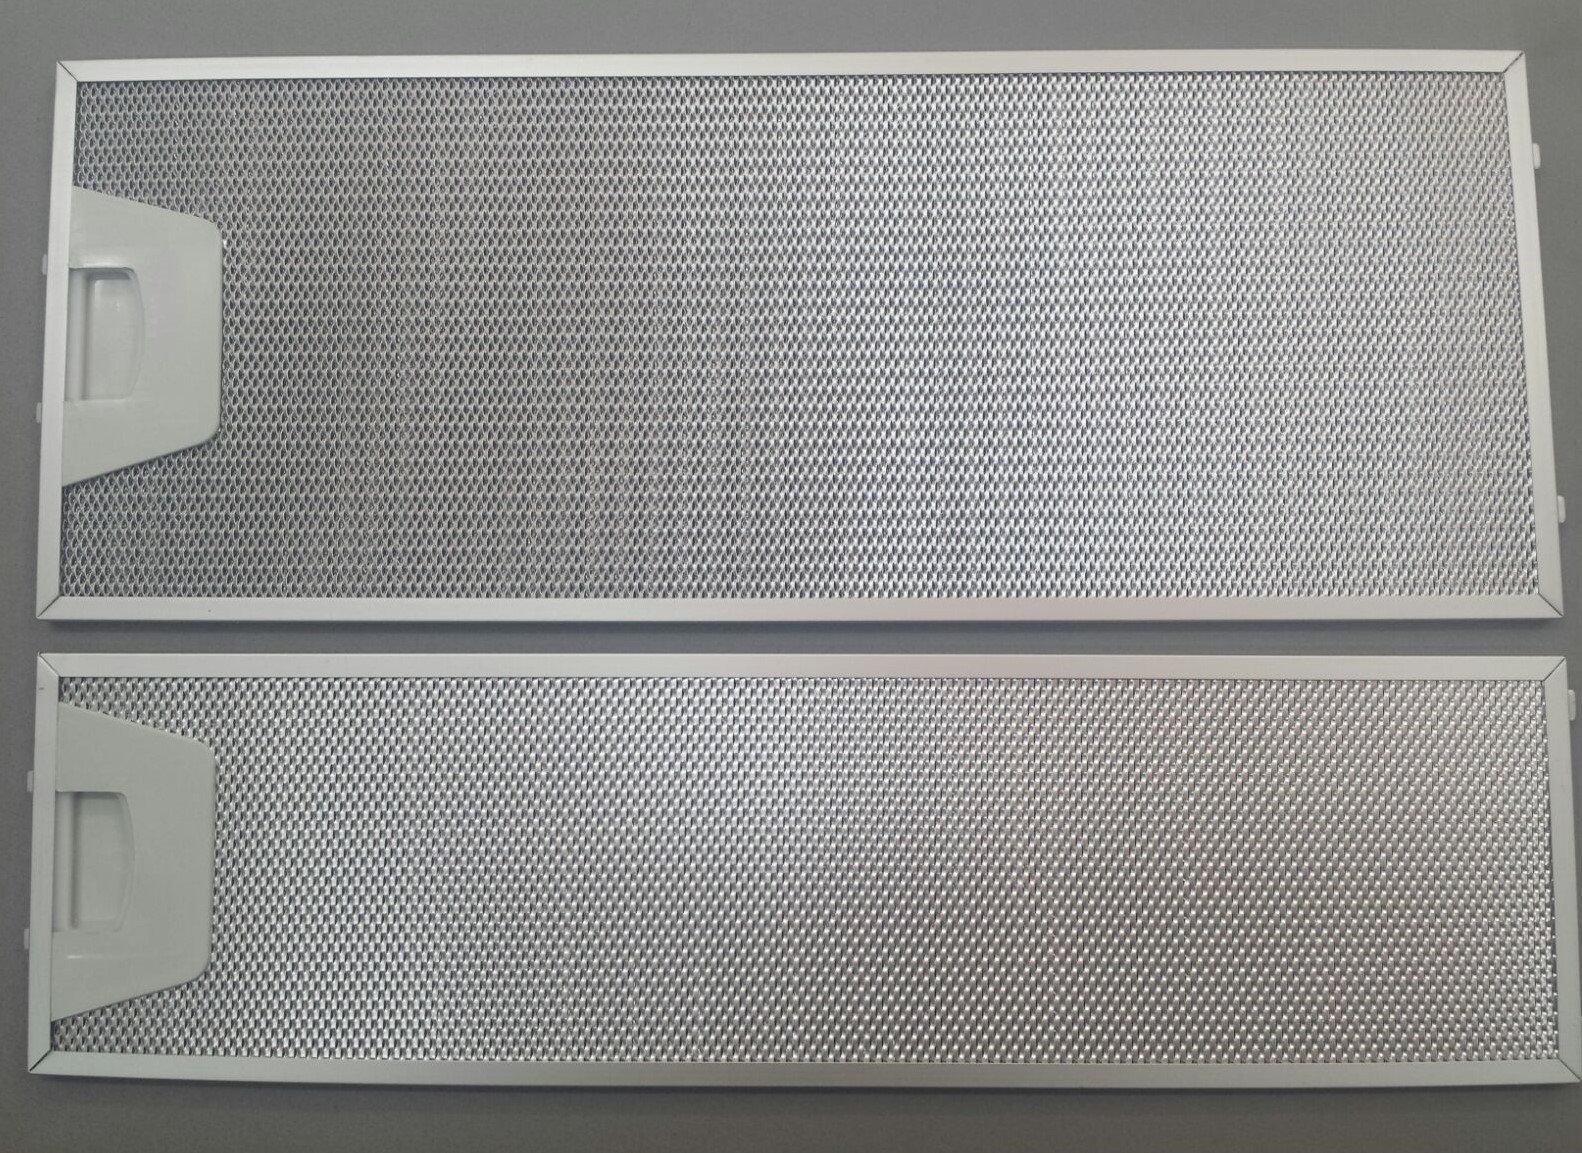 RECAMBIOS DREYMA Juego FILTROS (2) Campana Extractor TEKA TL1-62 TL2000. (61874021 + 61874022) (19,2x50 + 13,7x50): Amazon.es: Hogar